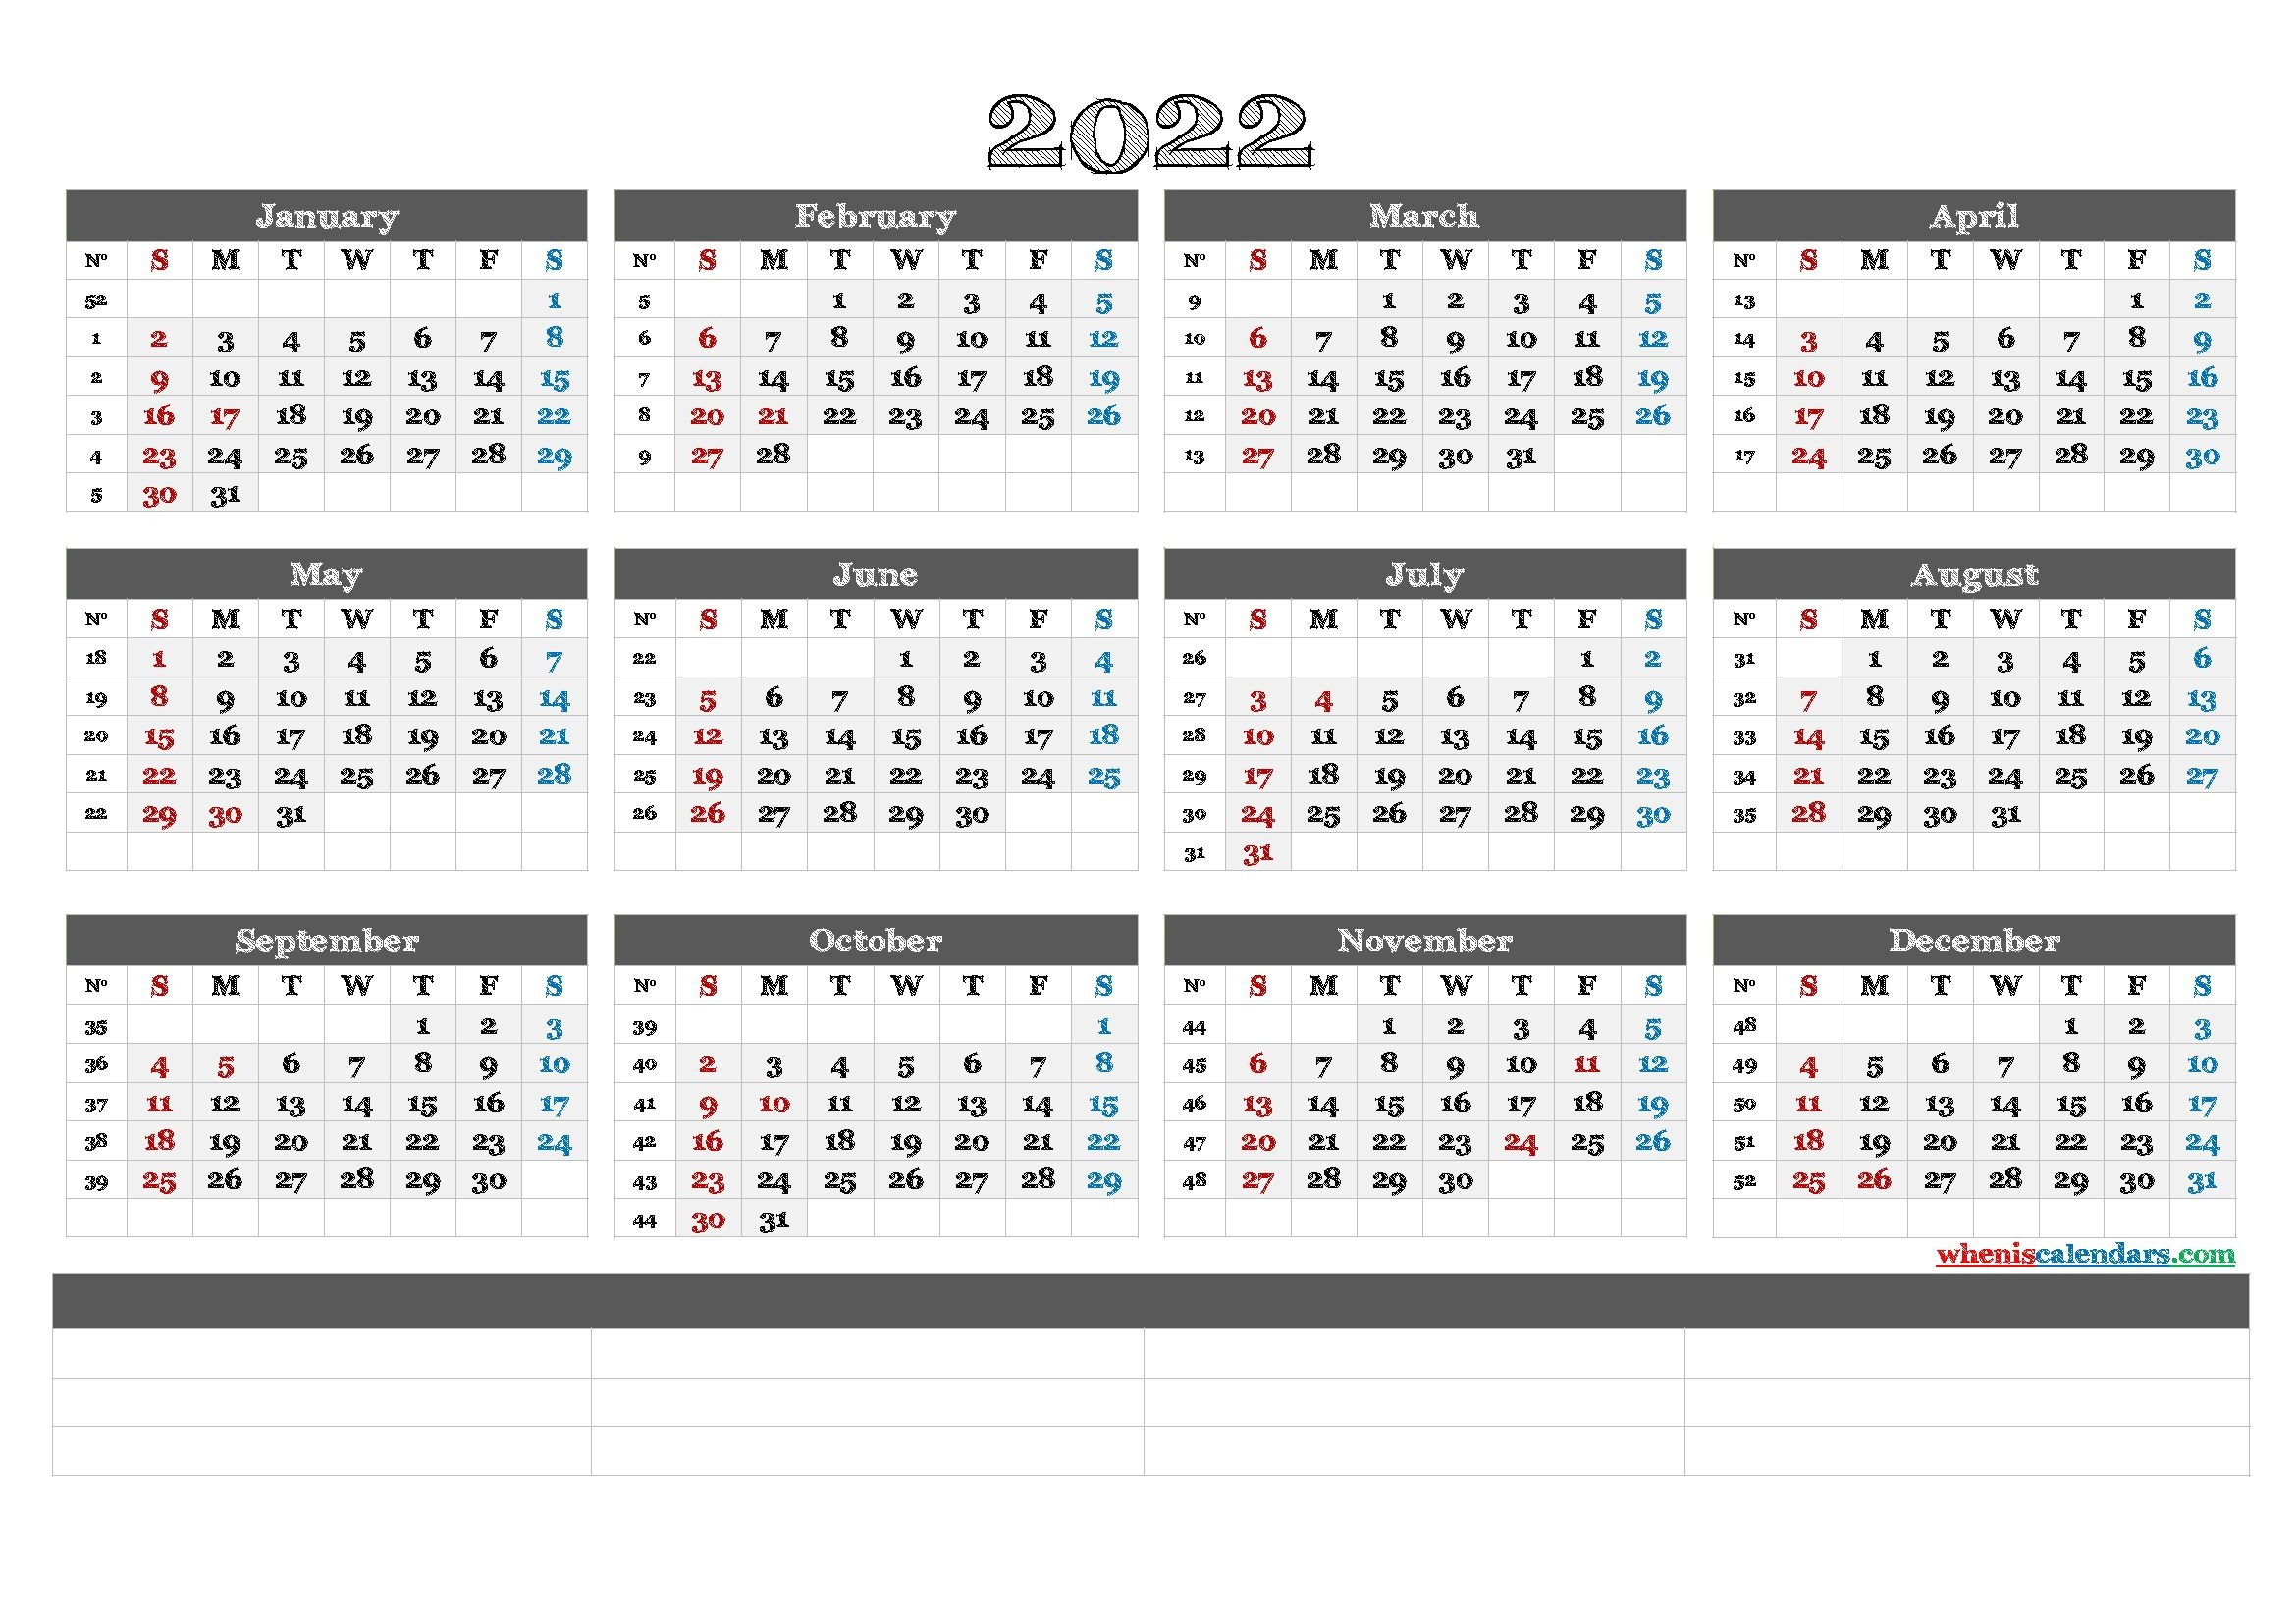 Printable 2022 Calendar By Month - Calendraex